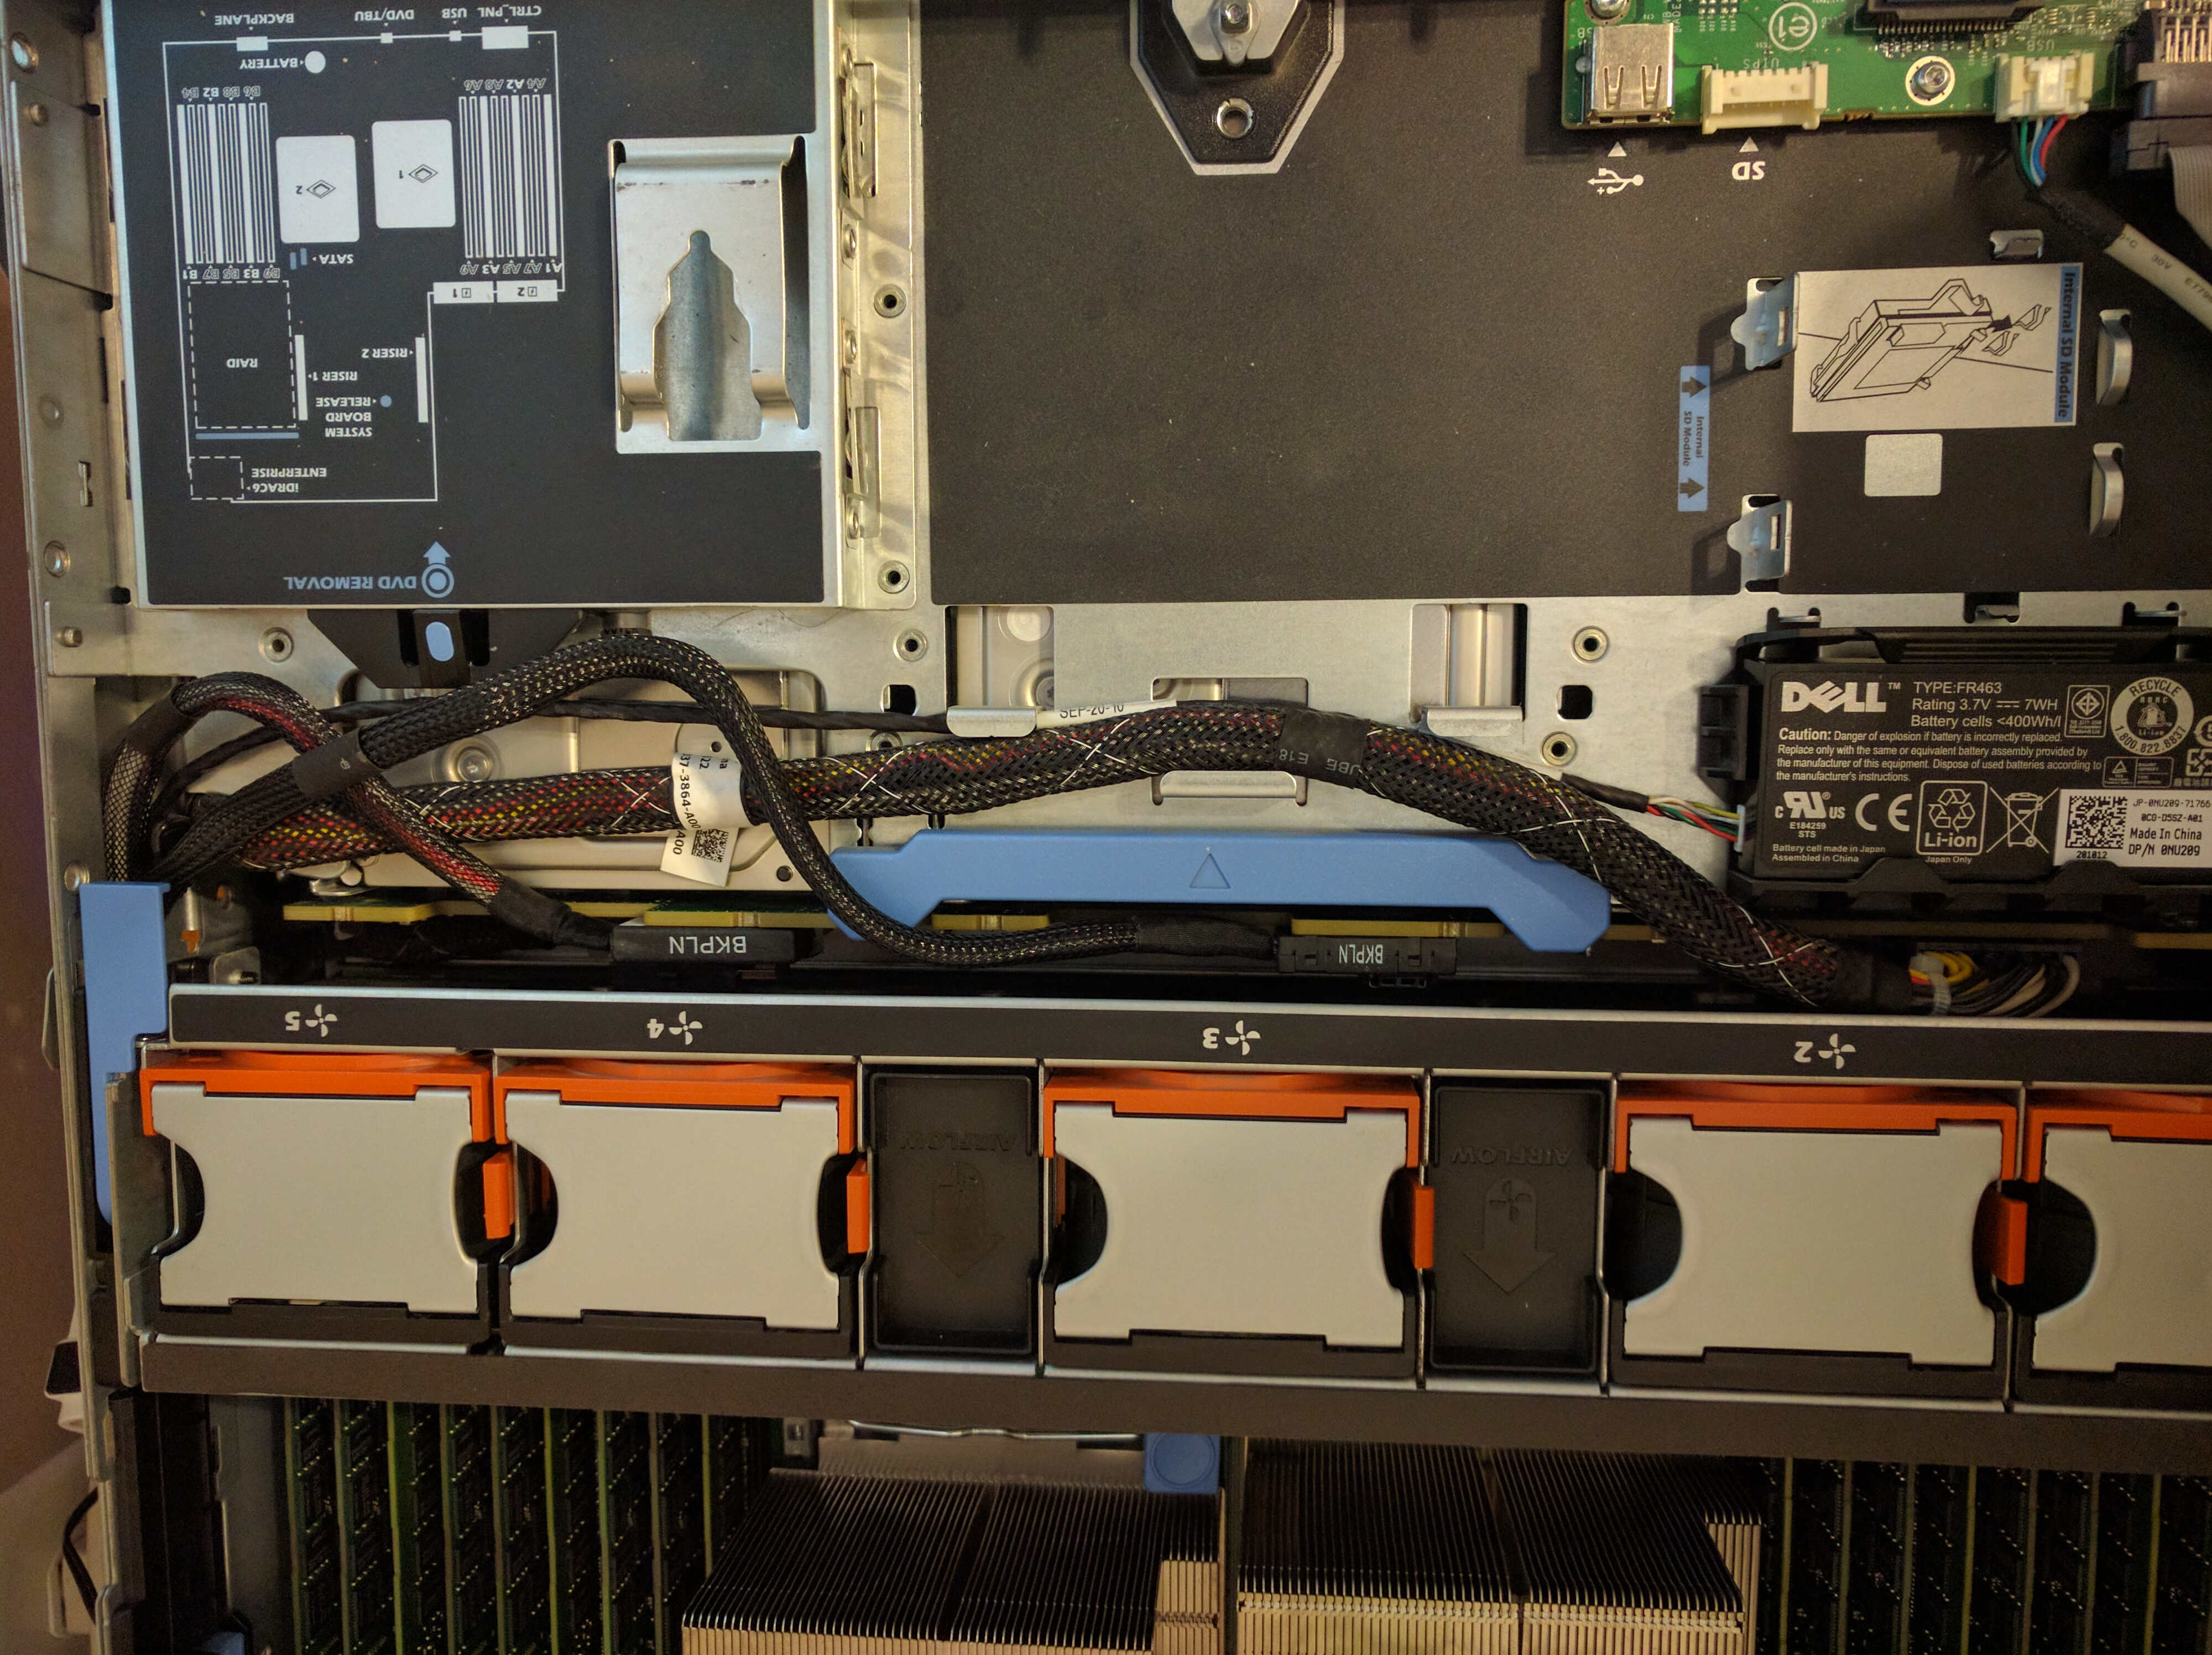 r710 Upgrades - Beefing up the Homelab   doyler net